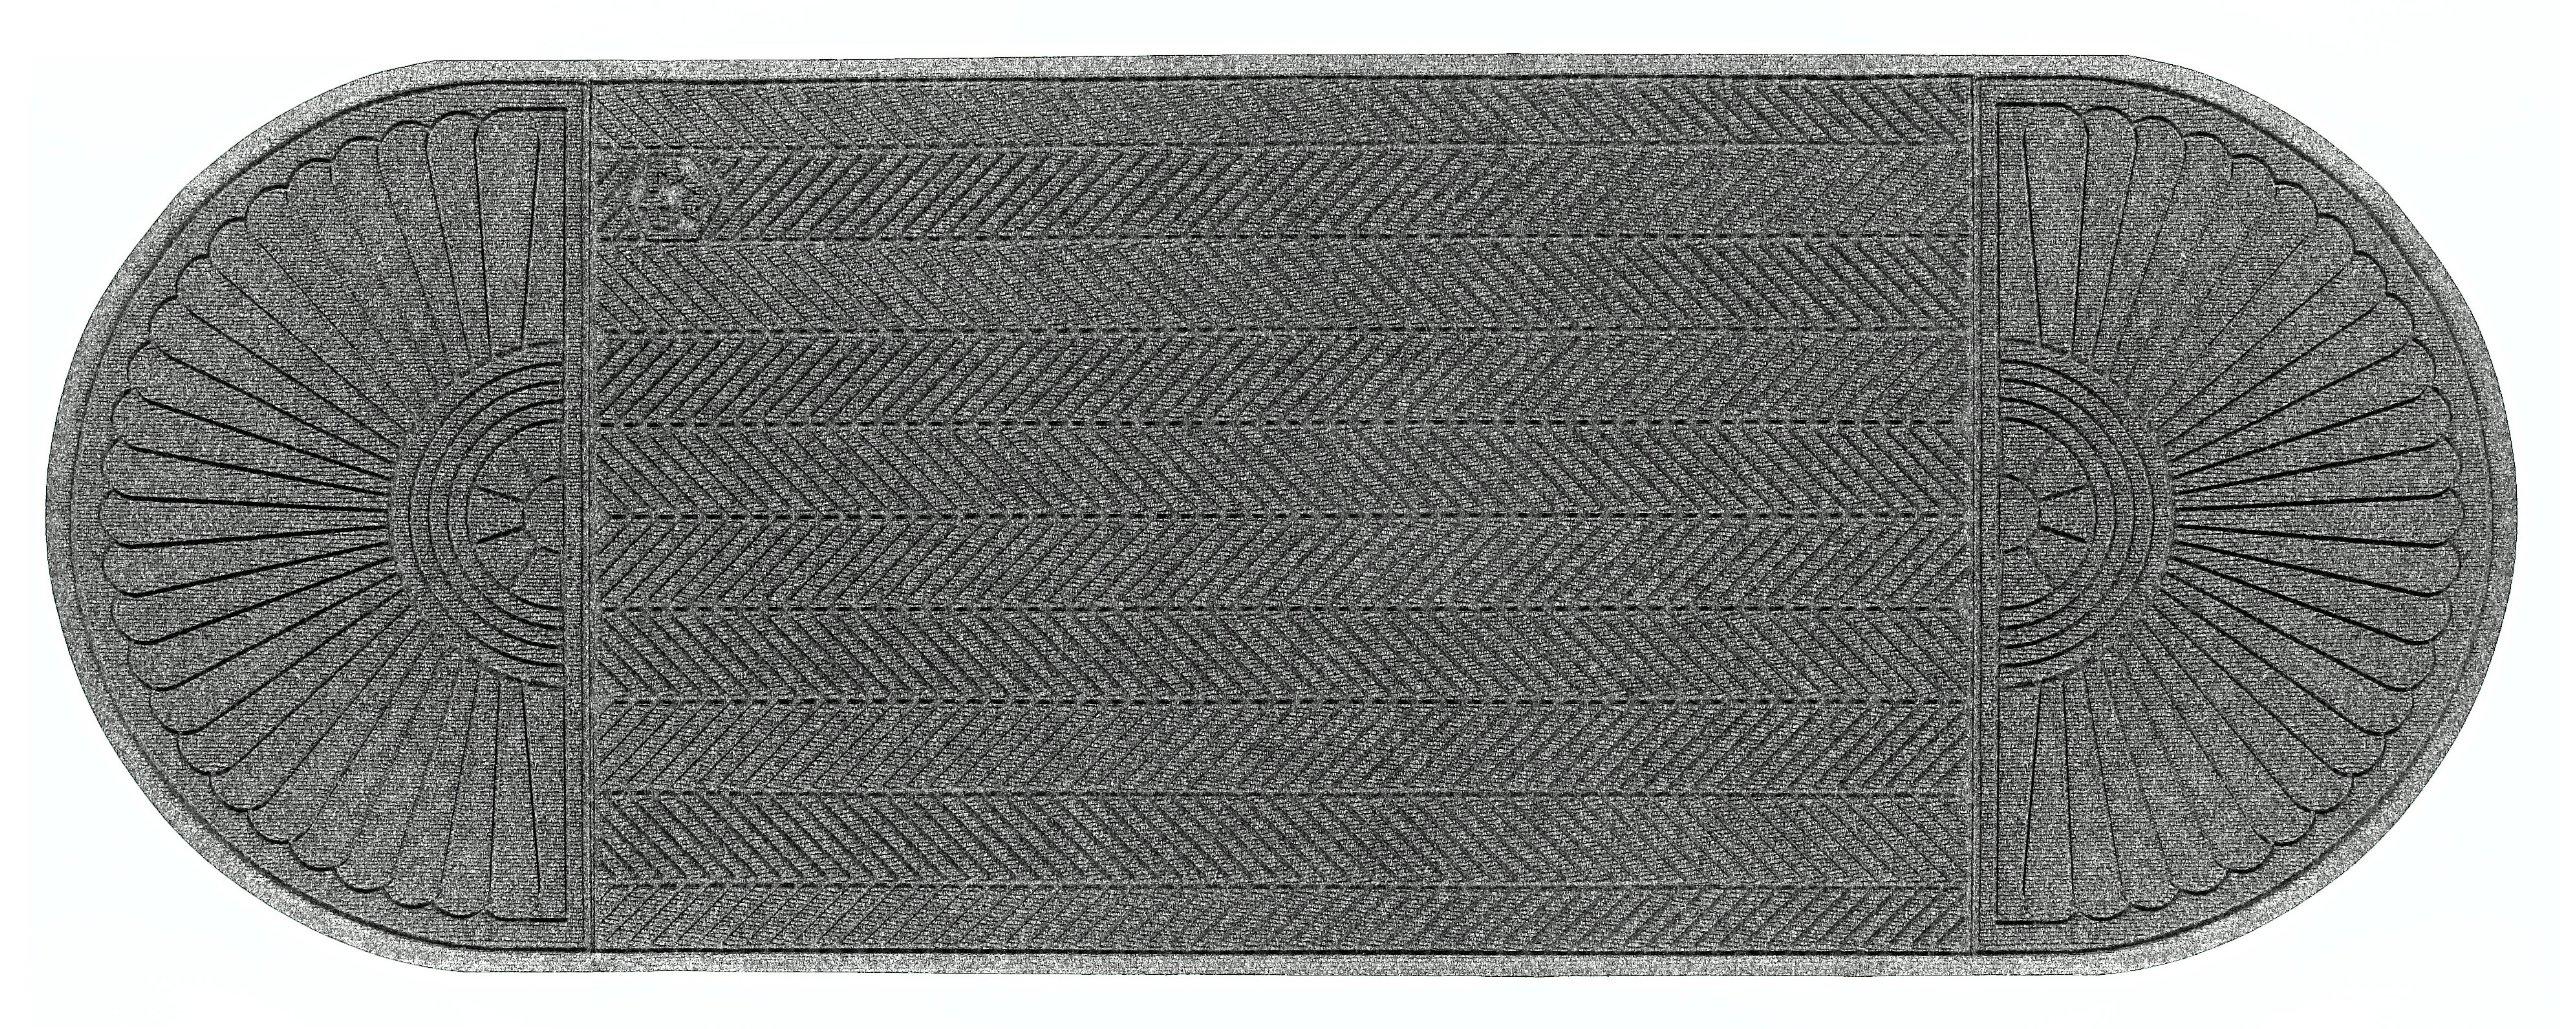 "M+A Matting 2244 Waterhog Eco Grand Elite PET Polyester Fiber Double Ends Entrance Indoor/Outdoor Floor Mat, SBR Rubber Backing, 10.1' Length x 6' Width, 3/8"" Thick, Grey Ash"